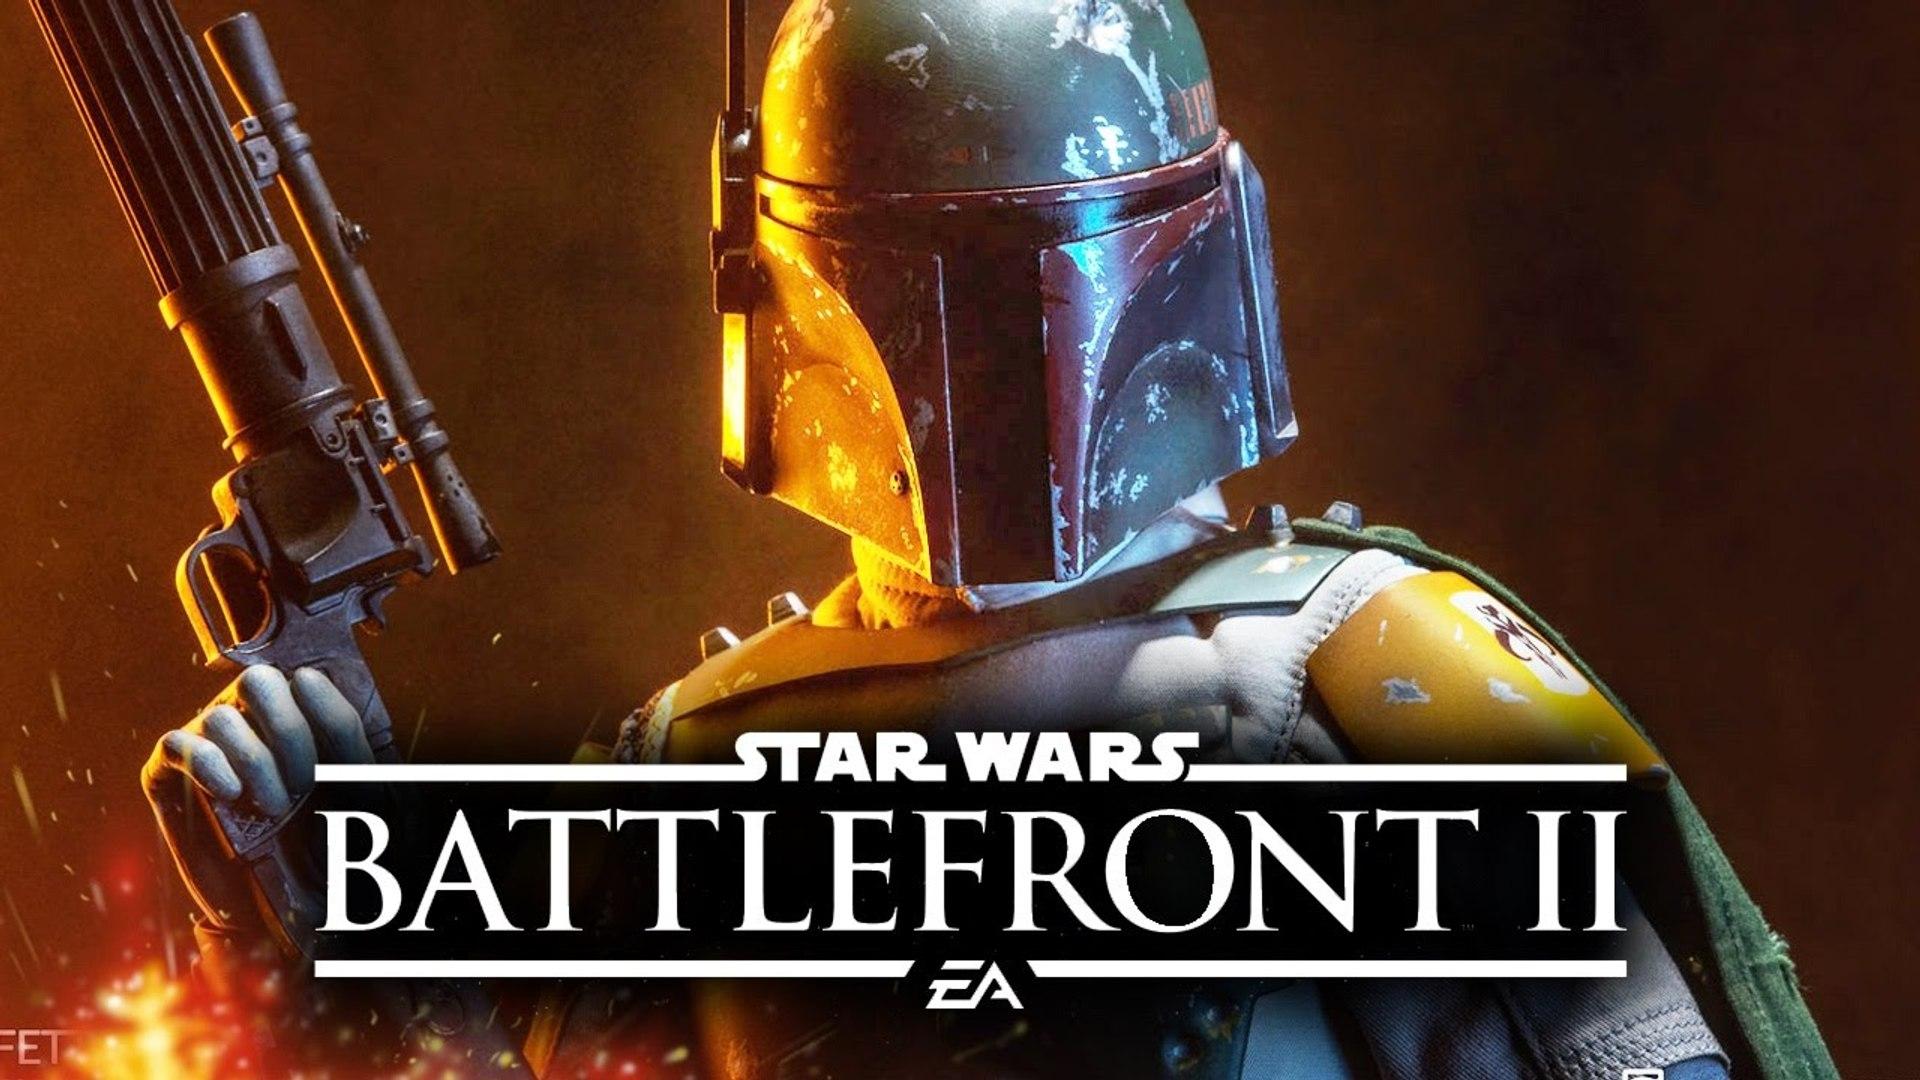 Star Wars Battlefront 2 Funny Boba Fett Glitch On Star Killer Base 2018 Video Dailymotion